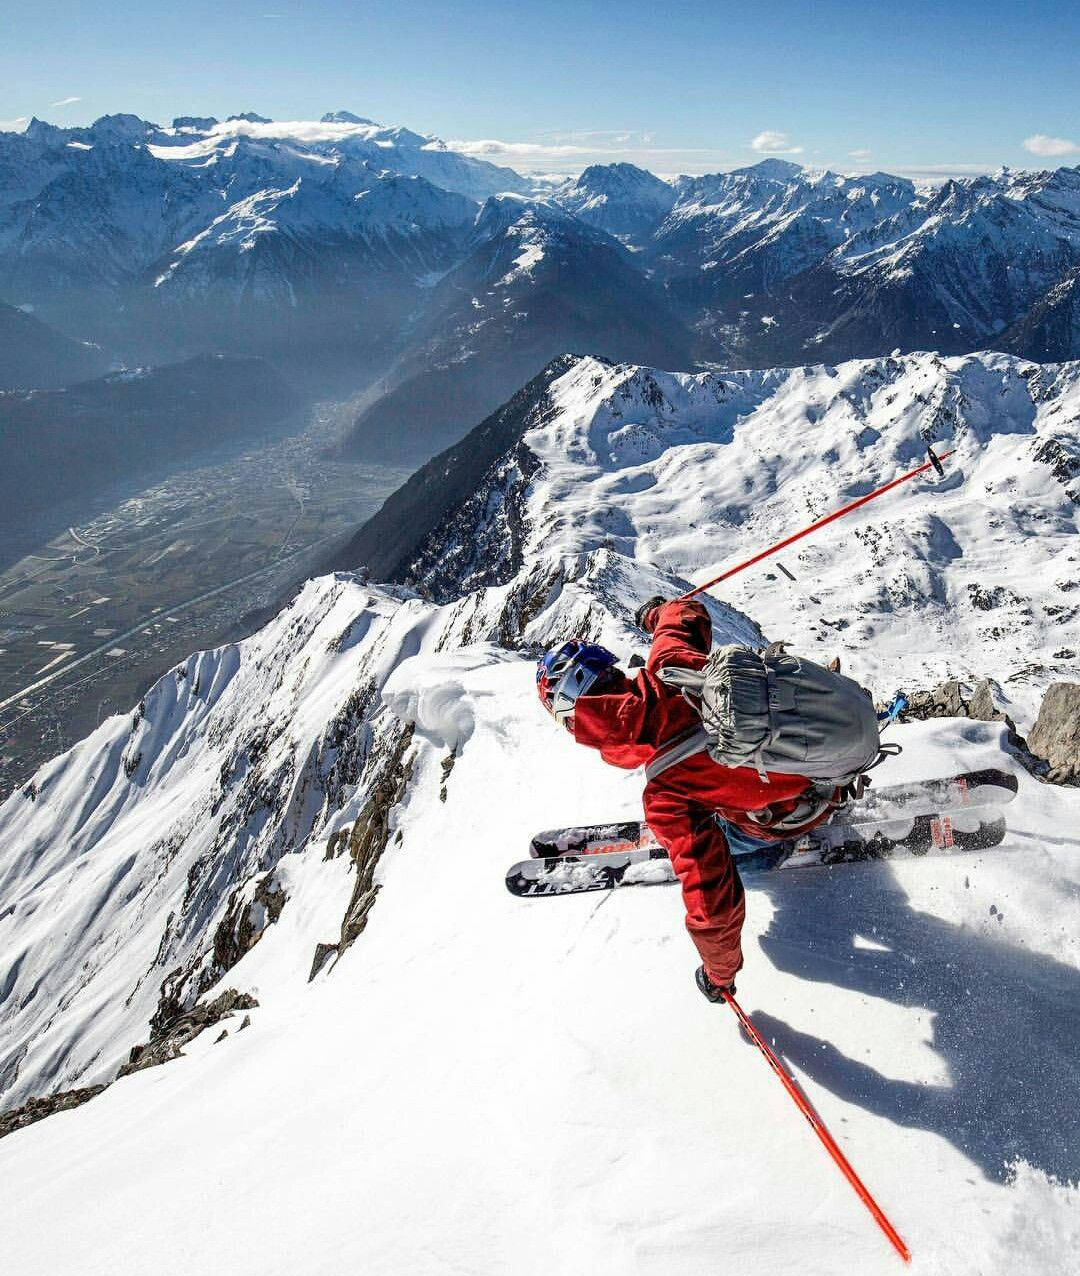 Ski Snowboard Camp More: Alpine Skiing, Extreme Sports, Snow Skiing